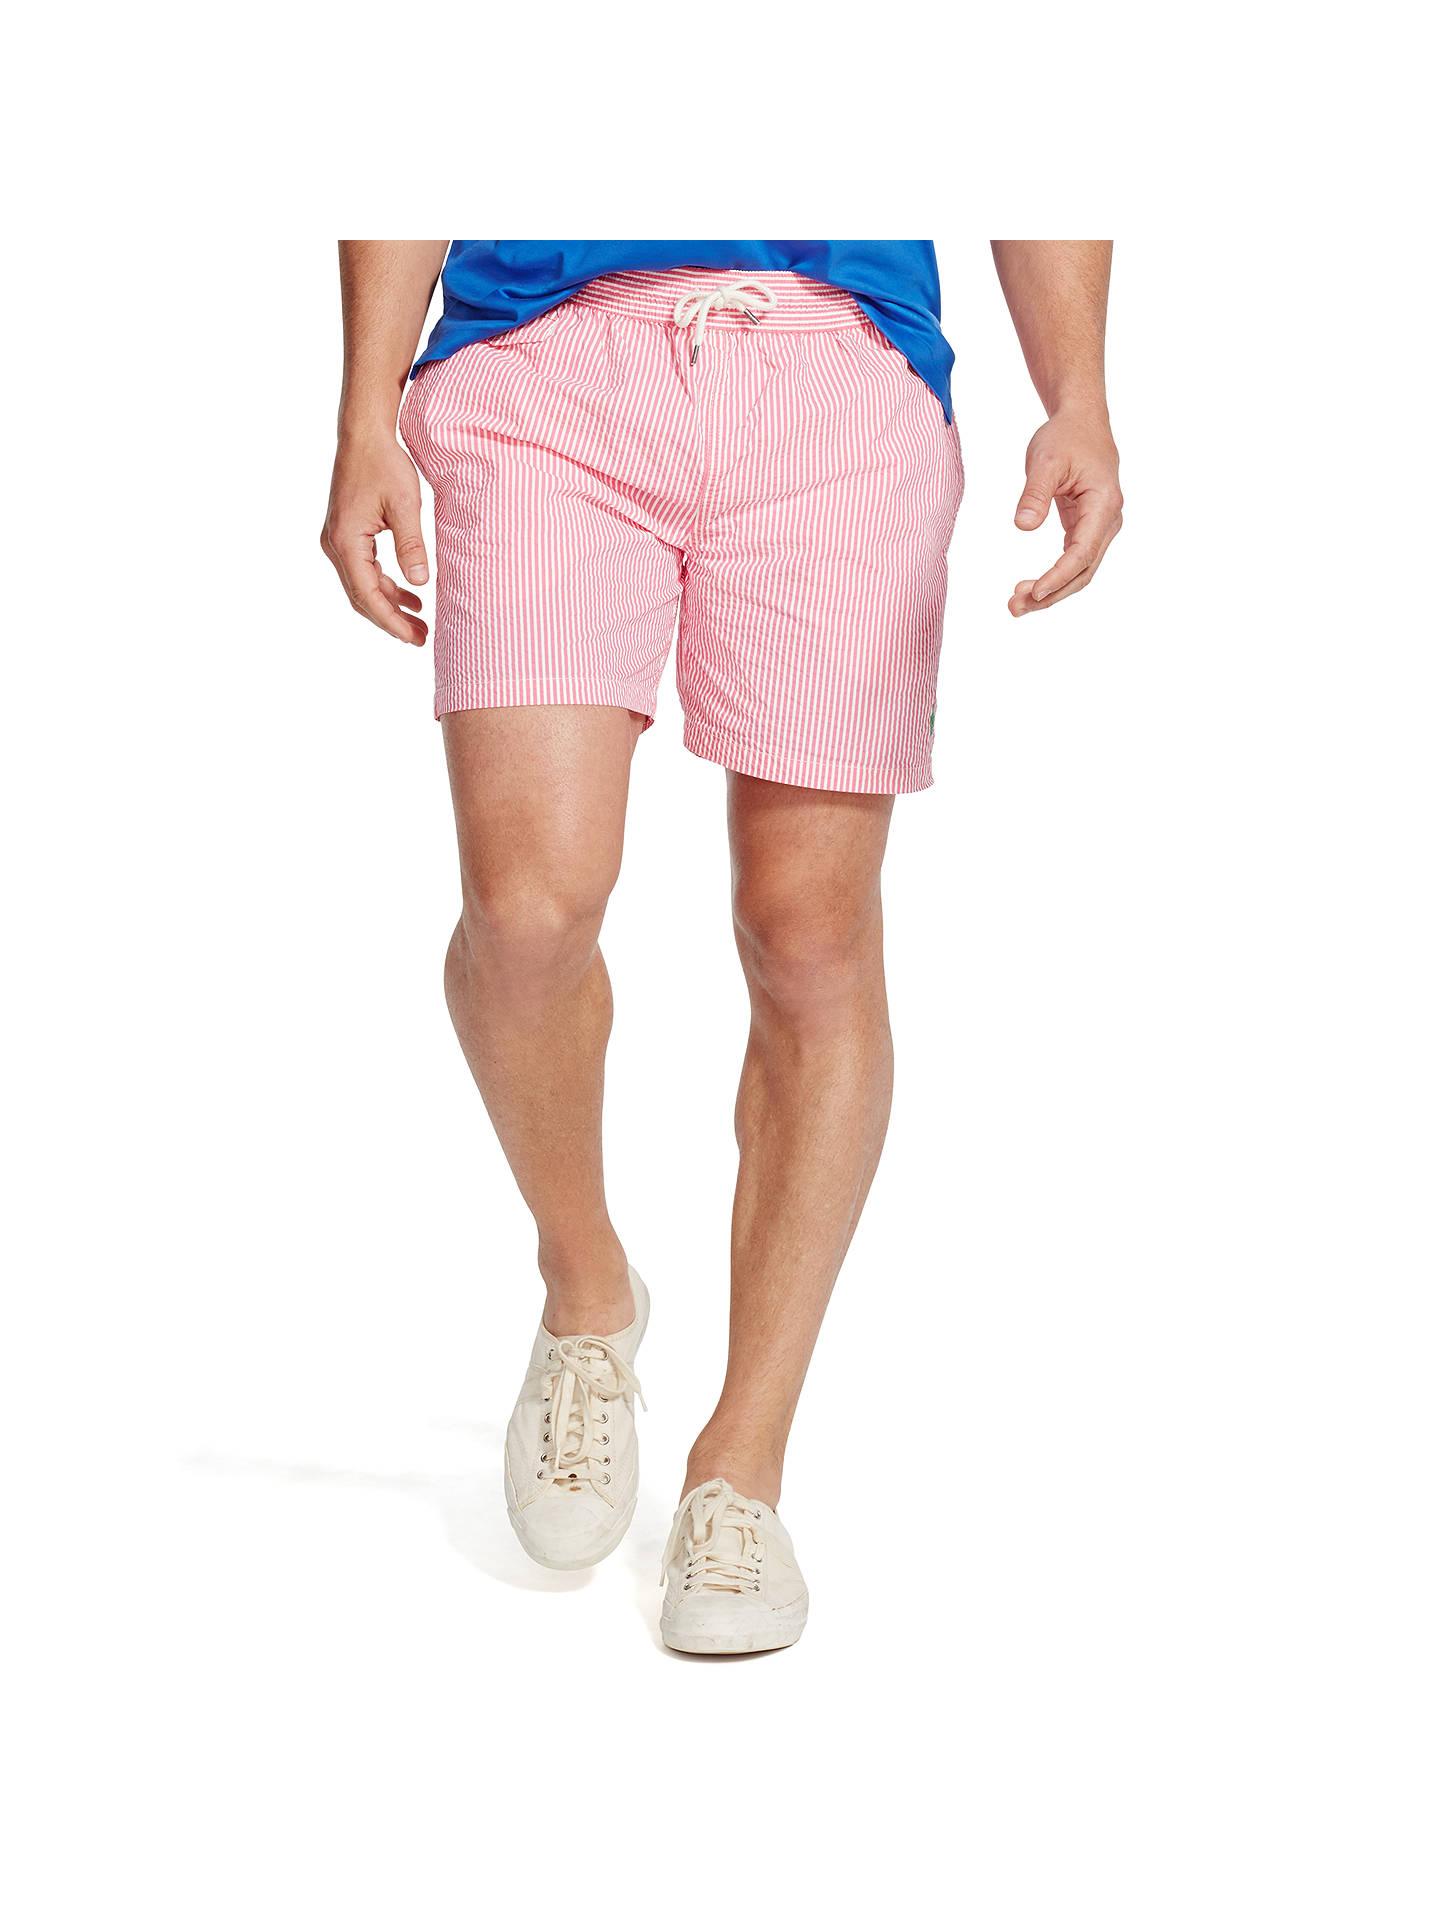 fca6aa66f3 Buy Polo Ralph Lauren Traveller Swim Shorts, Pink/White, M Online at  johnlewis ...